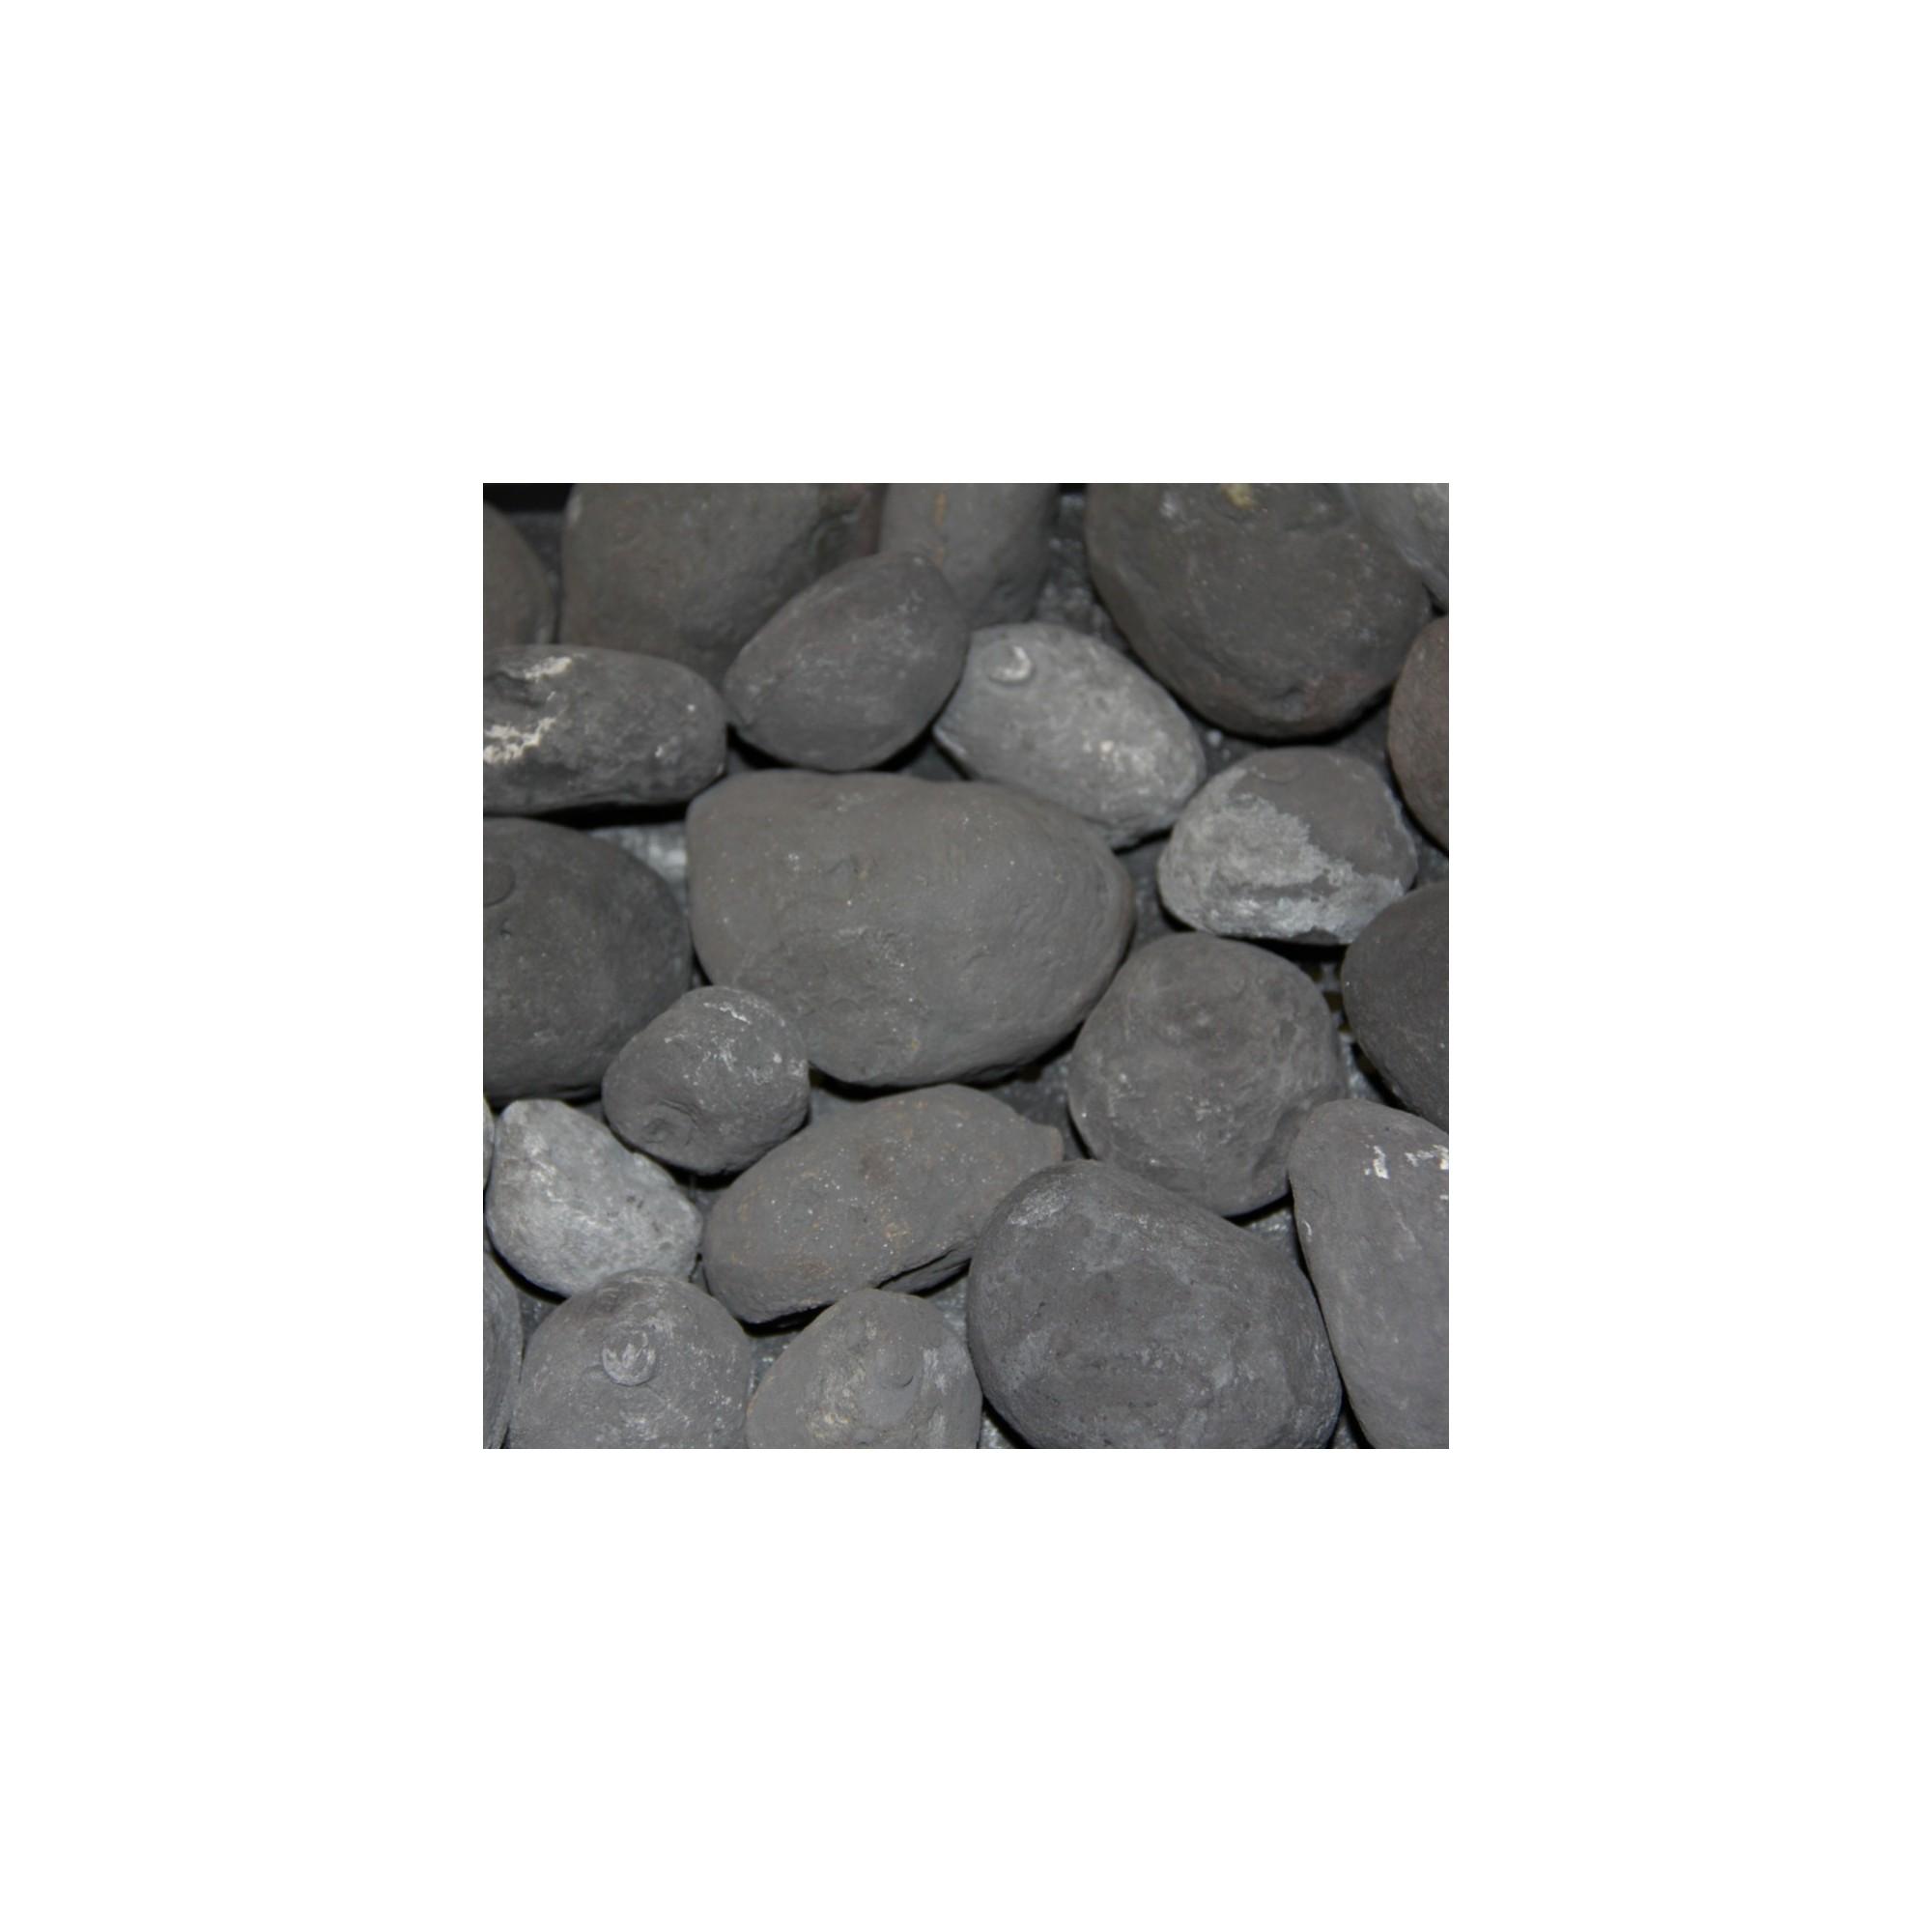 COAL A9E - A19 / E - K6 / M / MF / S - KM60